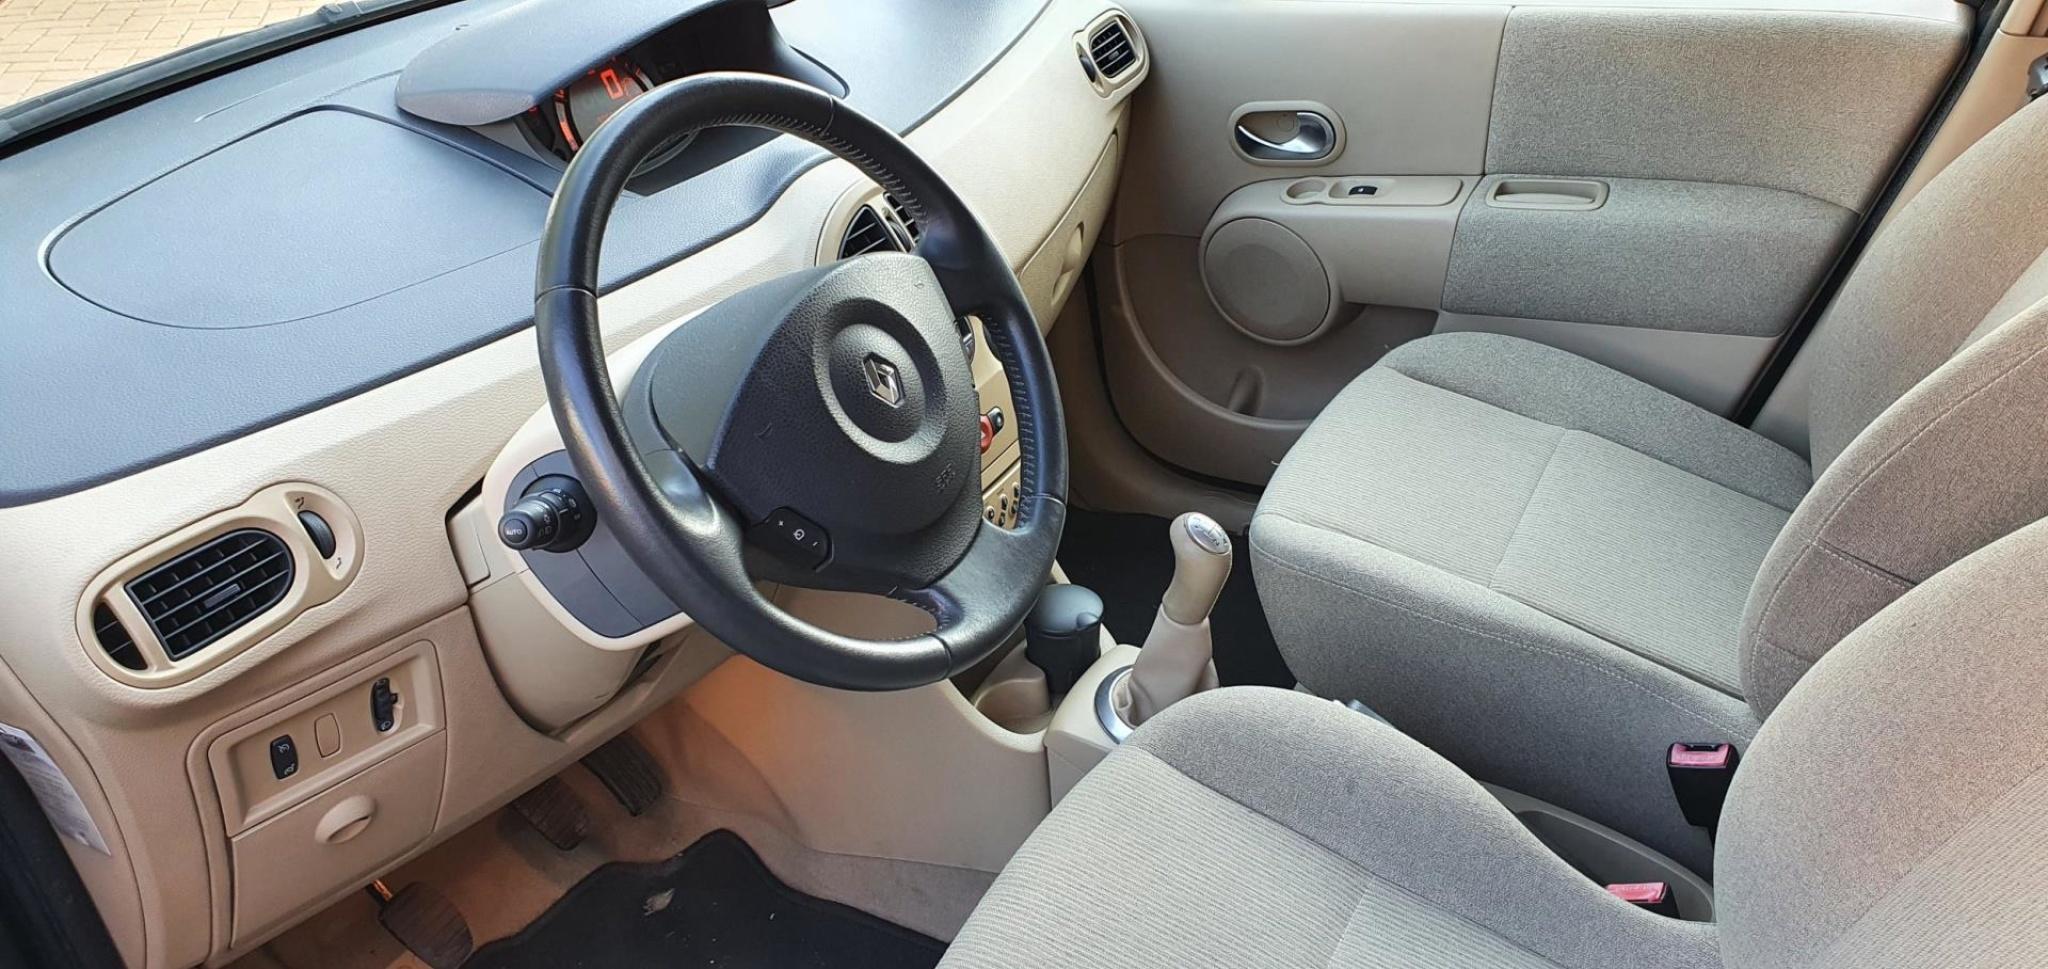 Renault-Modus-8